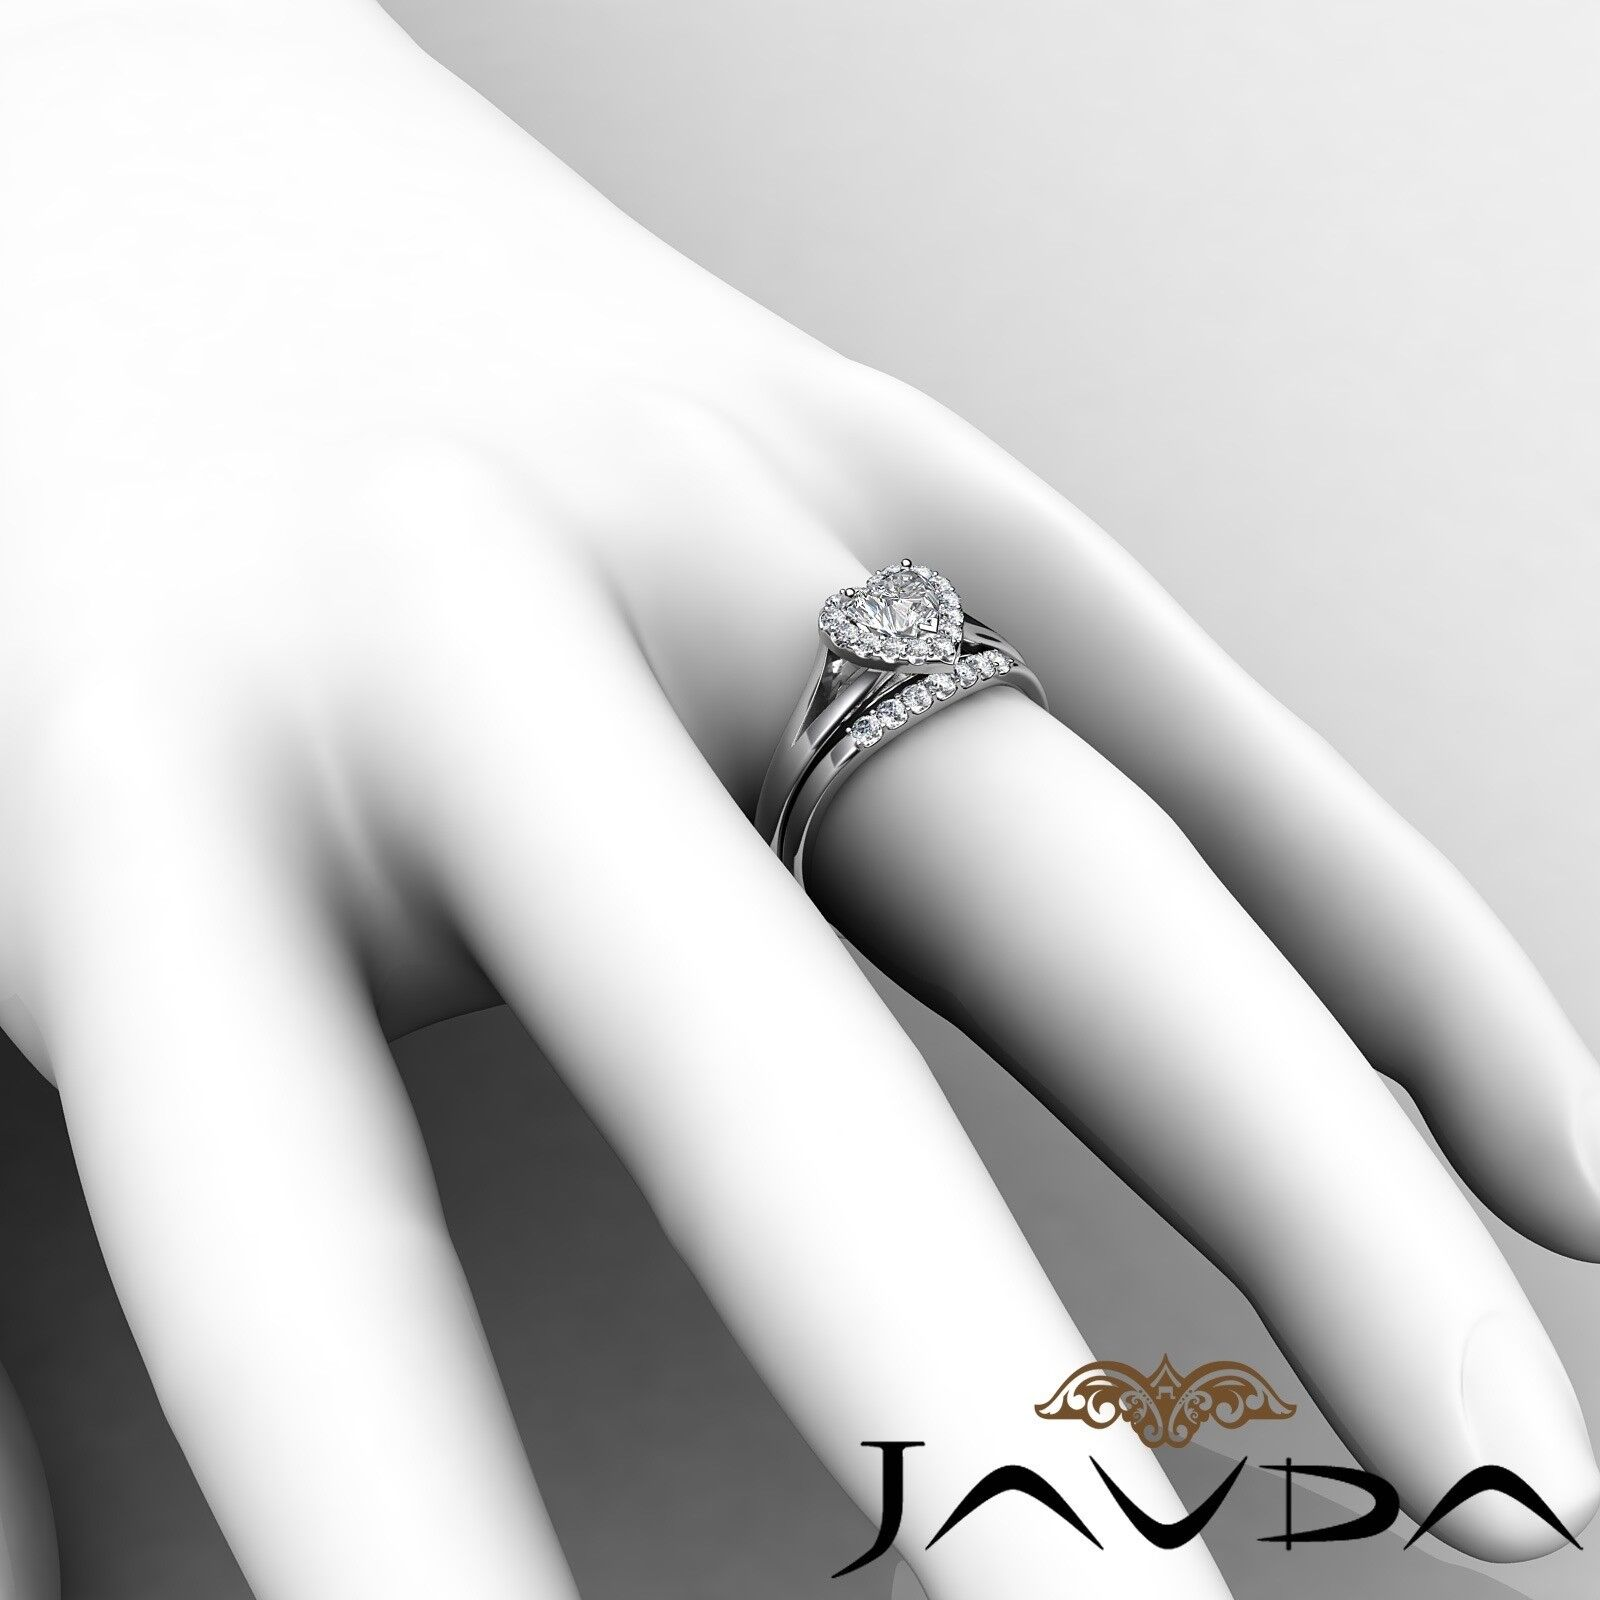 1.22ctw Pave Halo Bridal Set Heart Diamond Engagement Ring GIA G-VVS2 White Gold 6